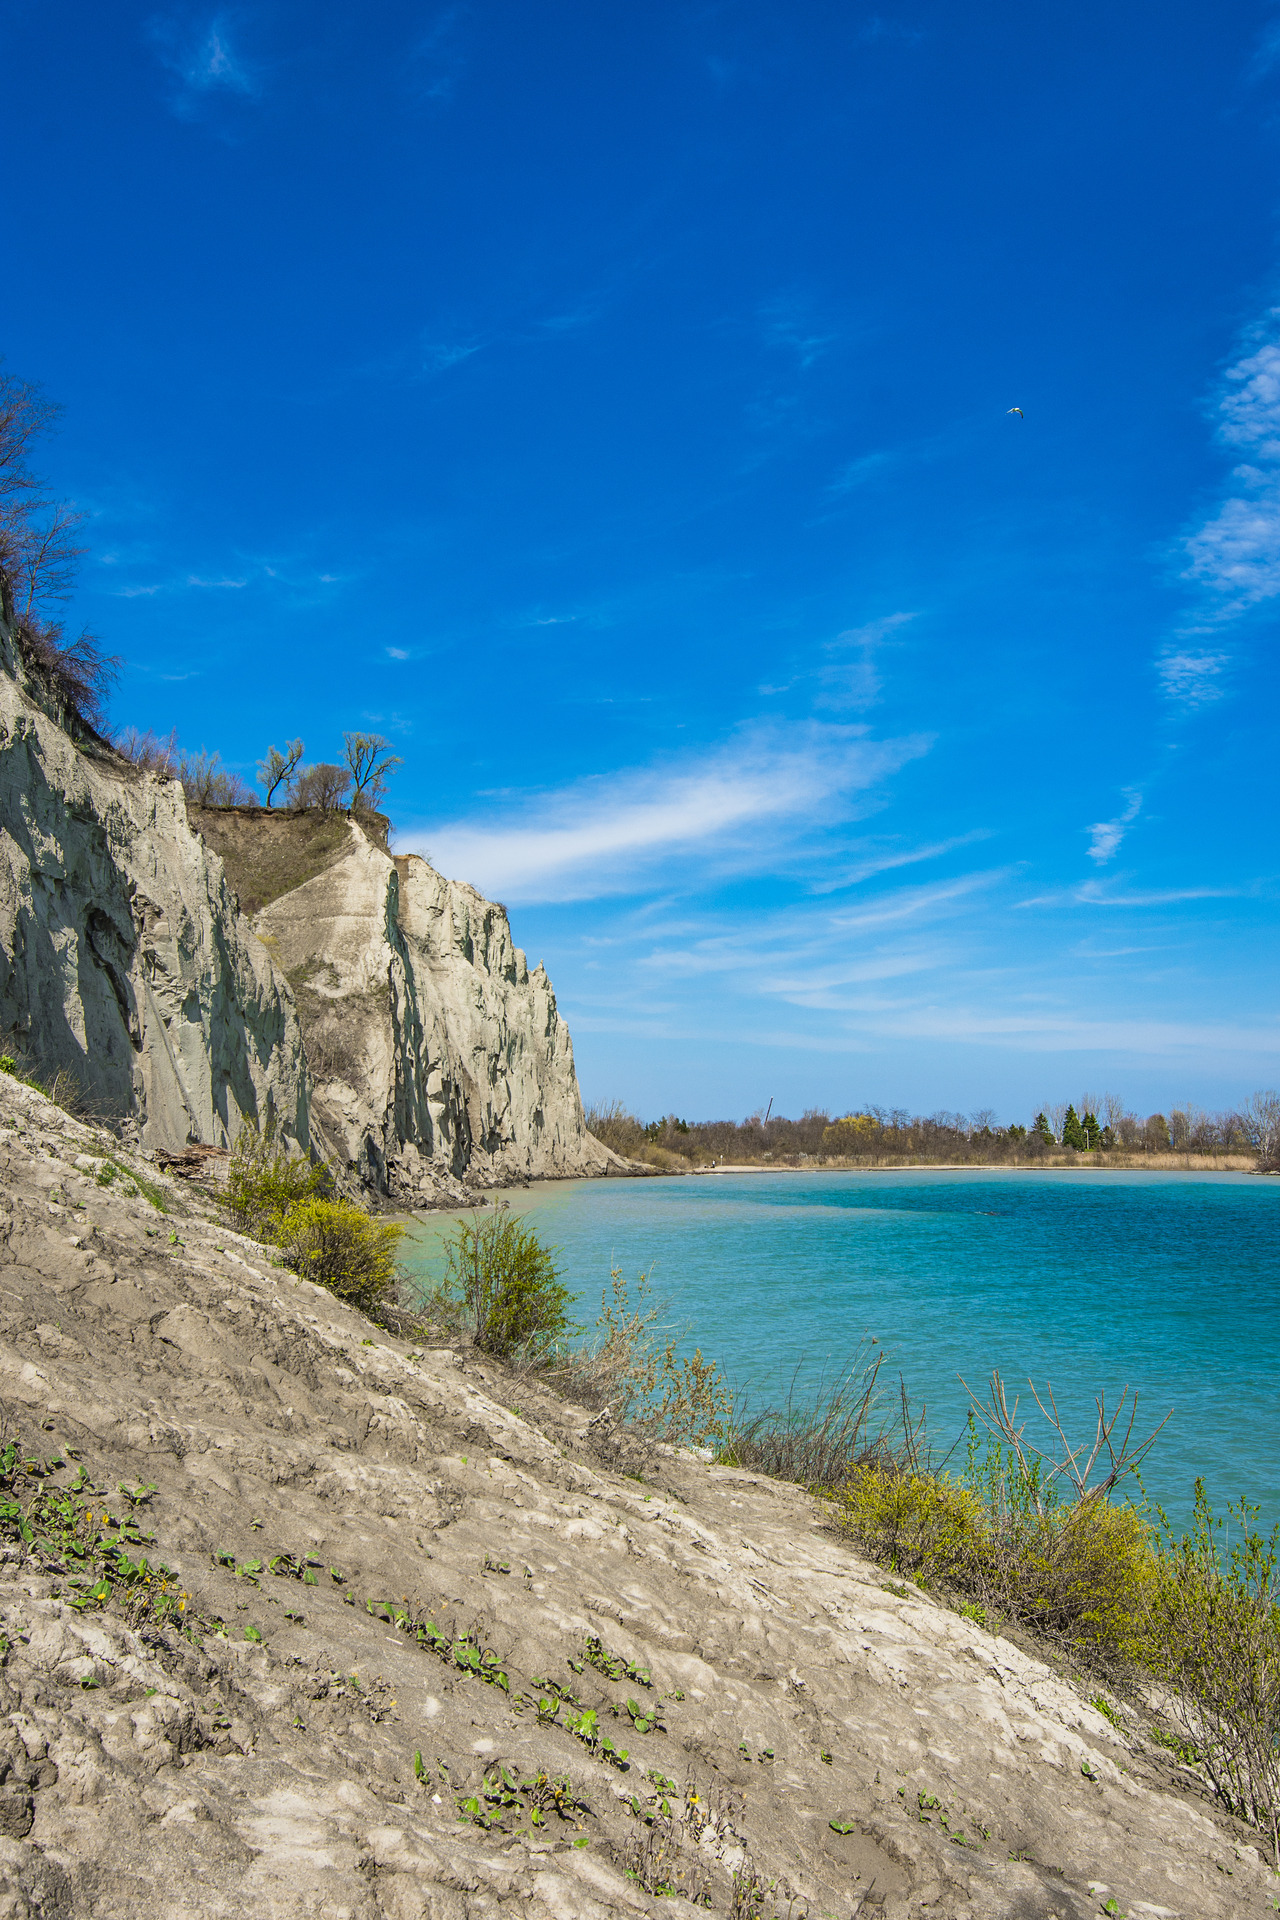 Breathtakingdestinations: Scarborough Bluffs – Canada (byViv Lynch)